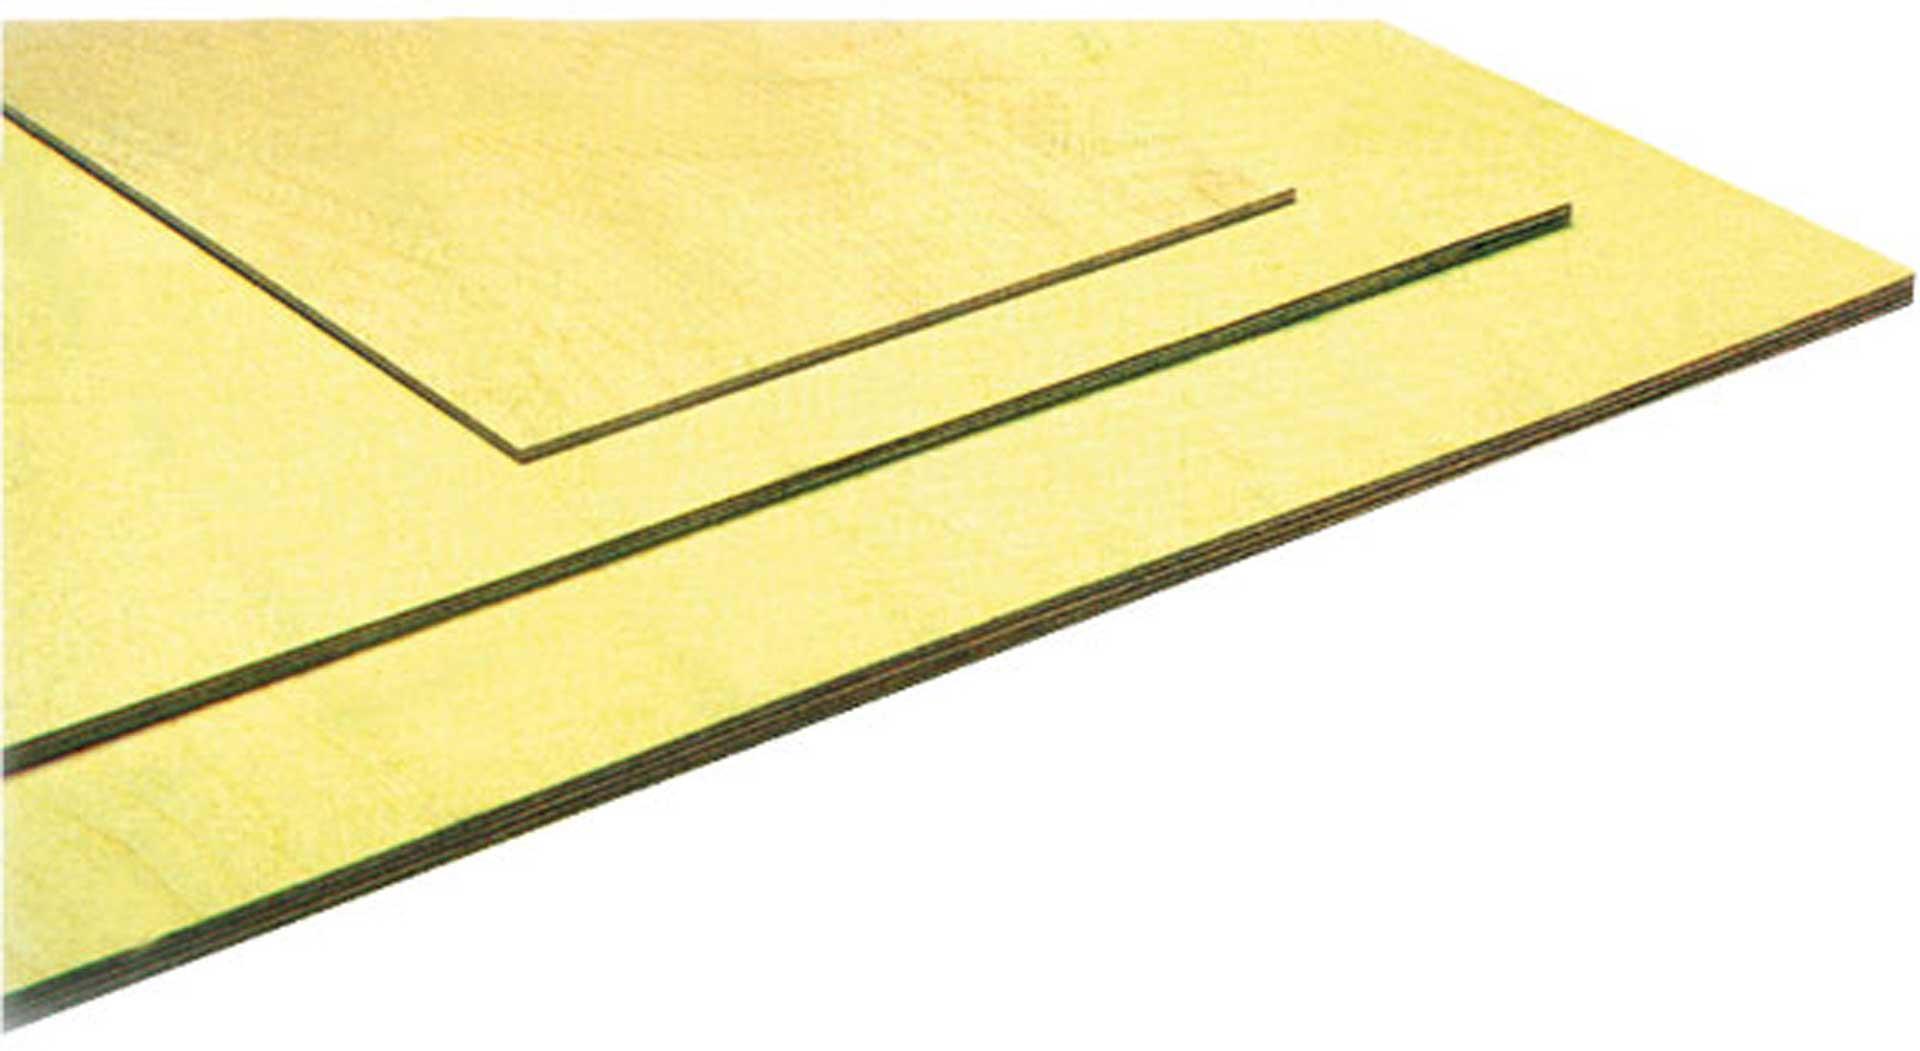 MODELLBAU LINDINGER BIRCH-SPERRY 6,0/300/1000MM